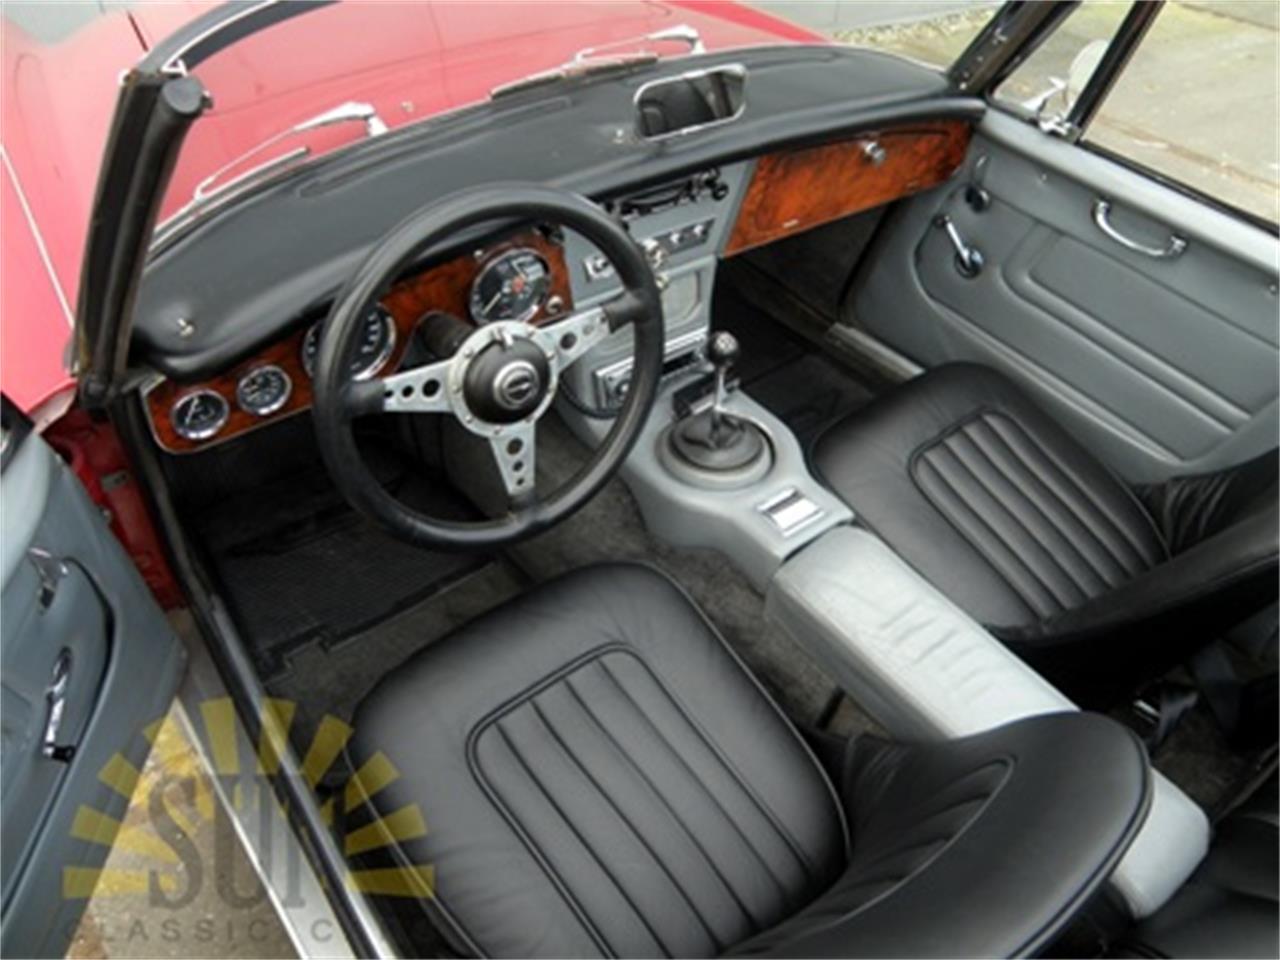 Large Picture of '63 Austin-Healey 3000 Mark II located in Waalwijk Noord Brabant - $76,500.00 - MCD8